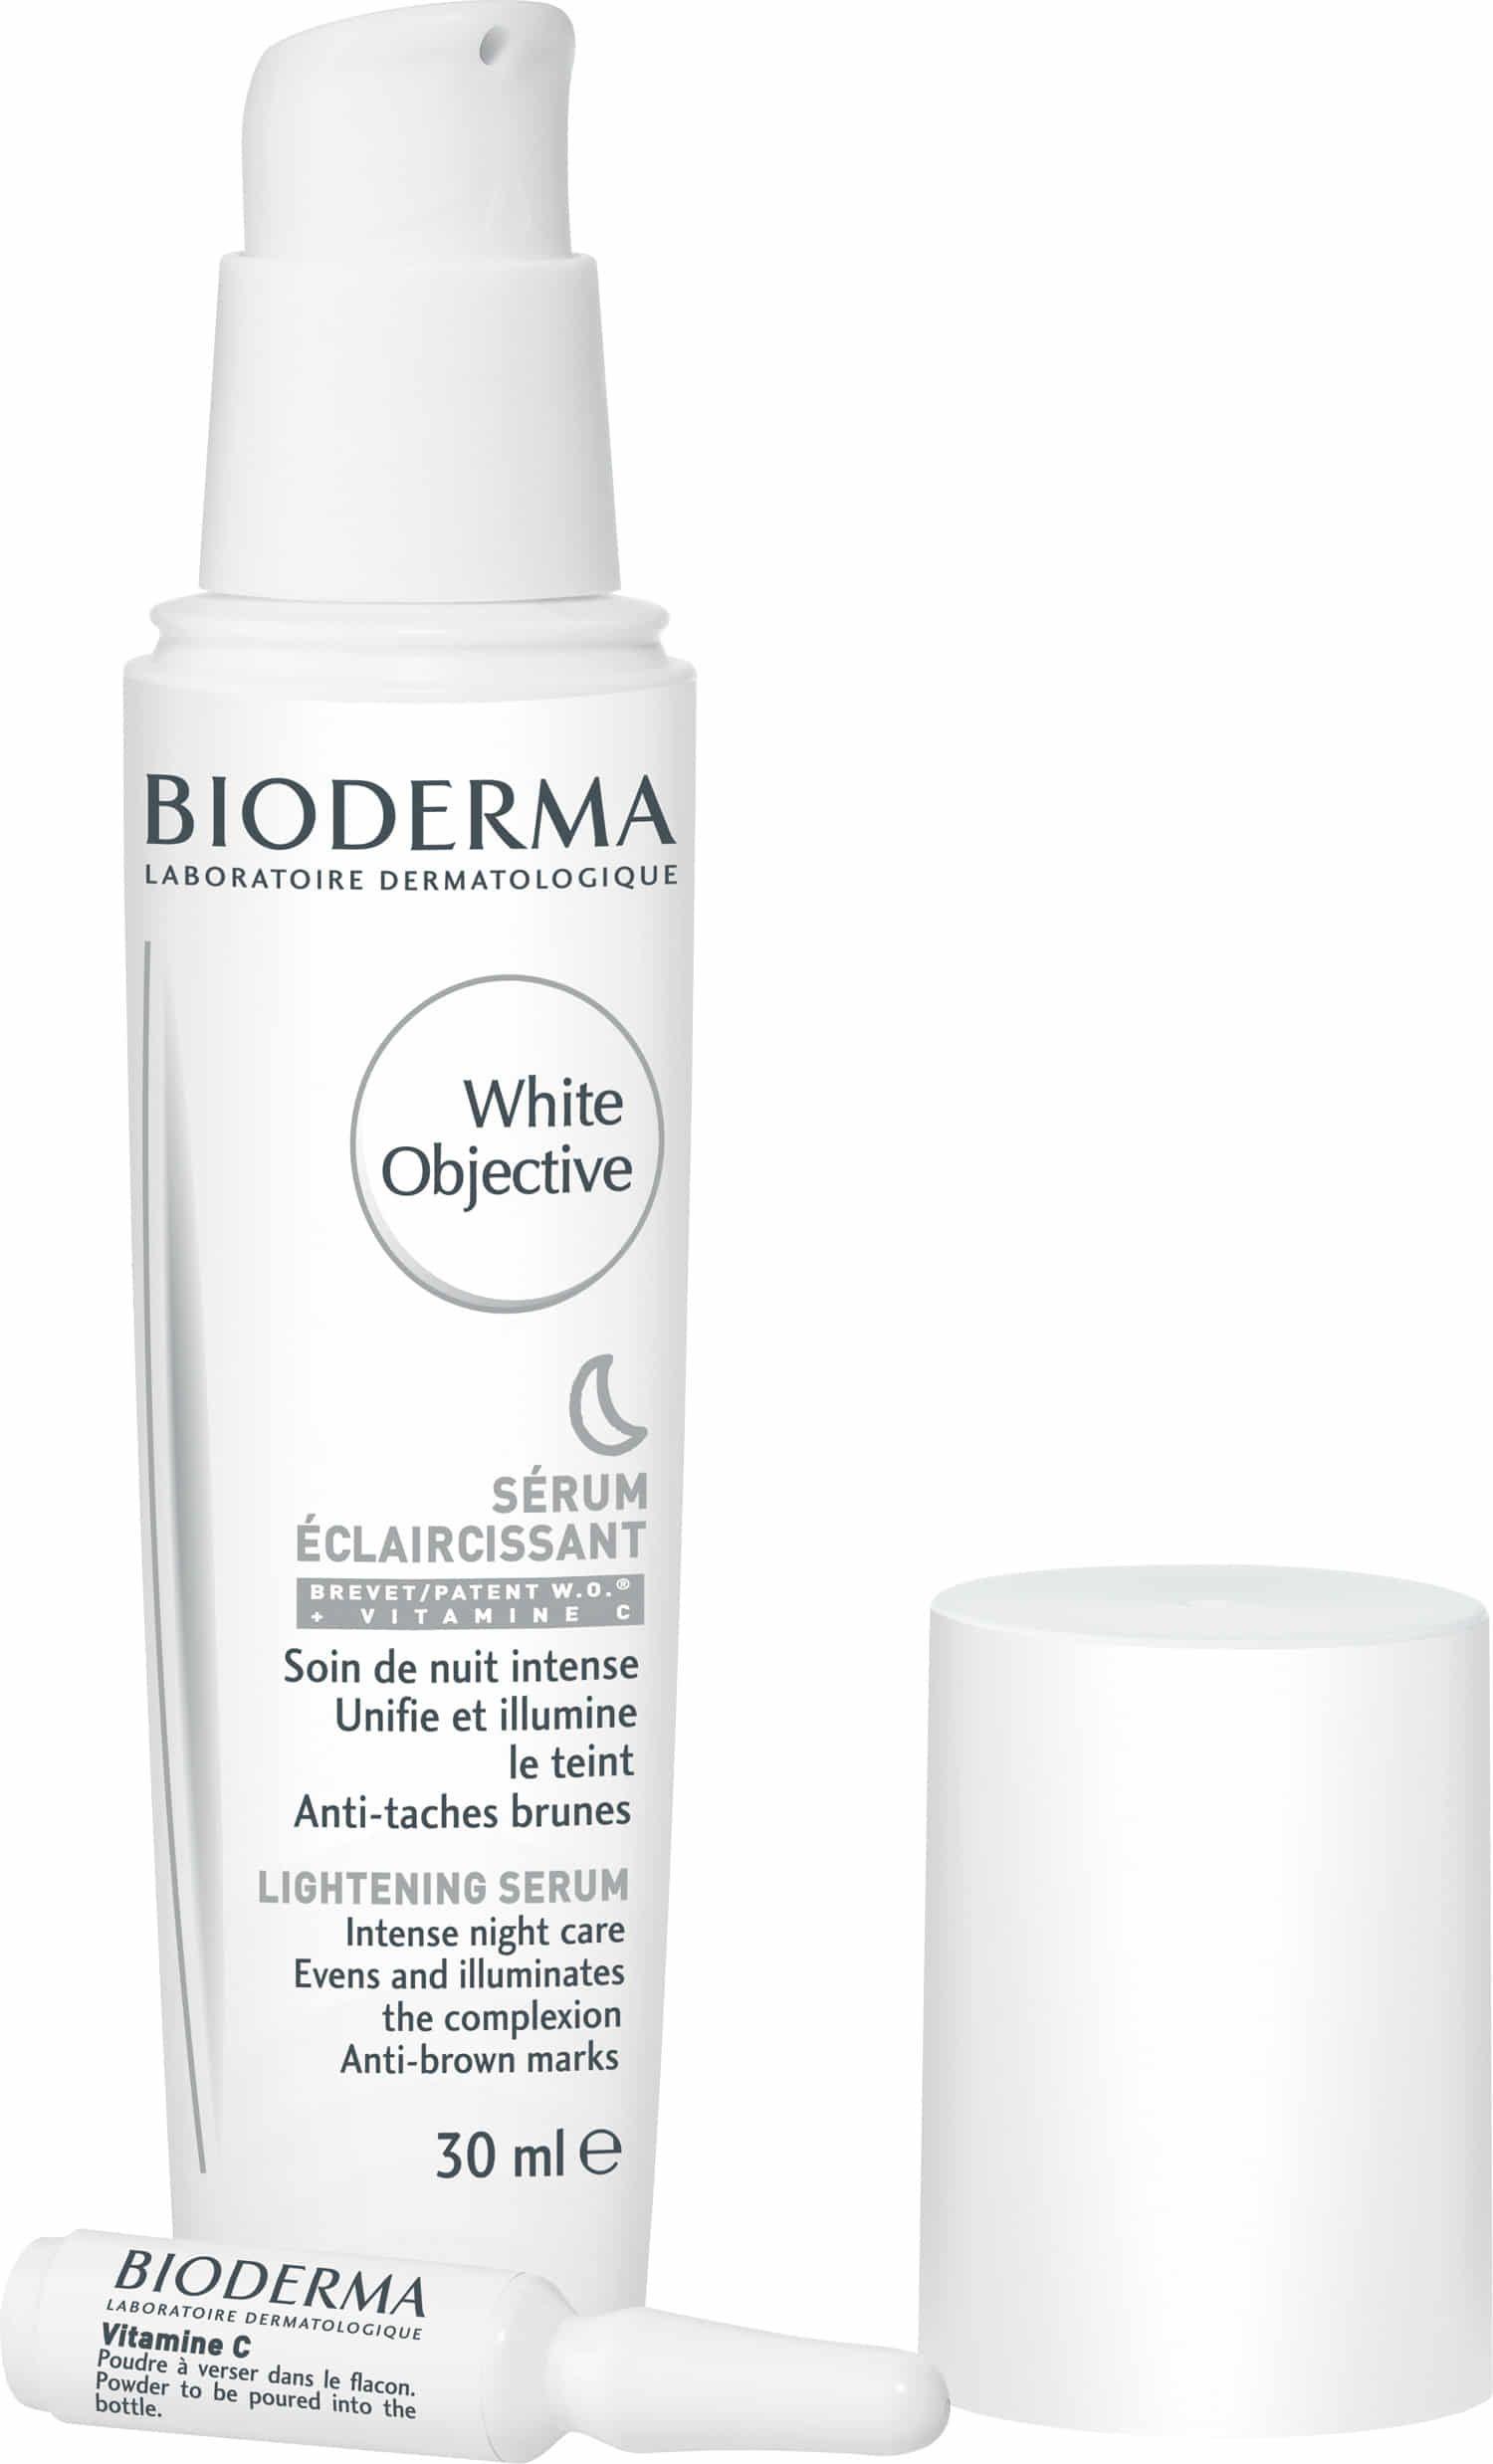 Bioderma White Objective Lightening Serum 30ml Serum Lighten